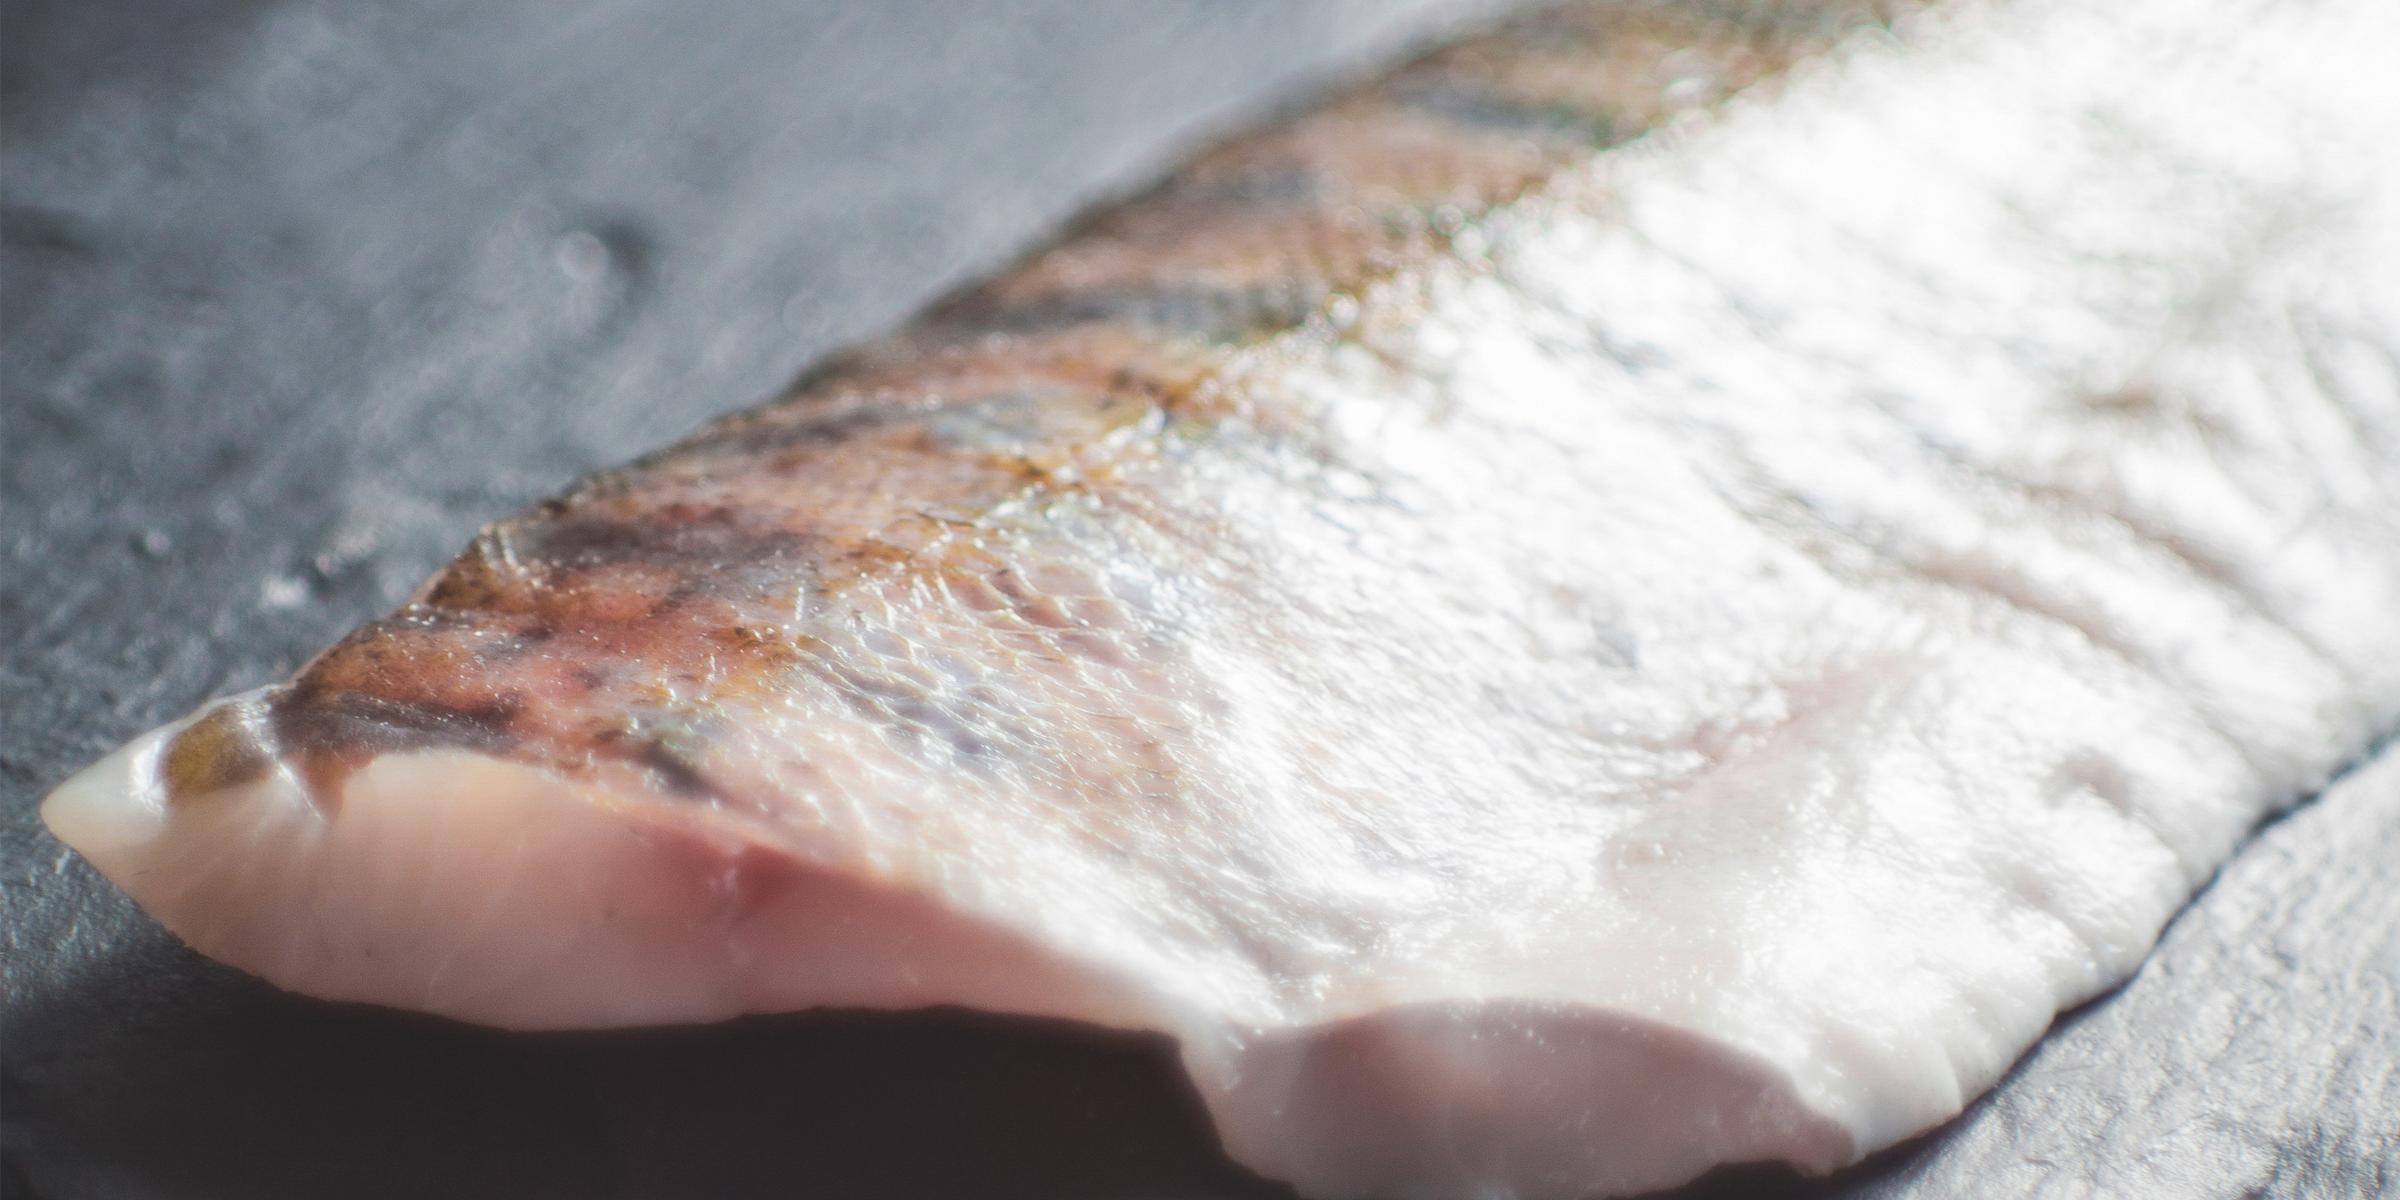 omega 3 fatty acids found in fish